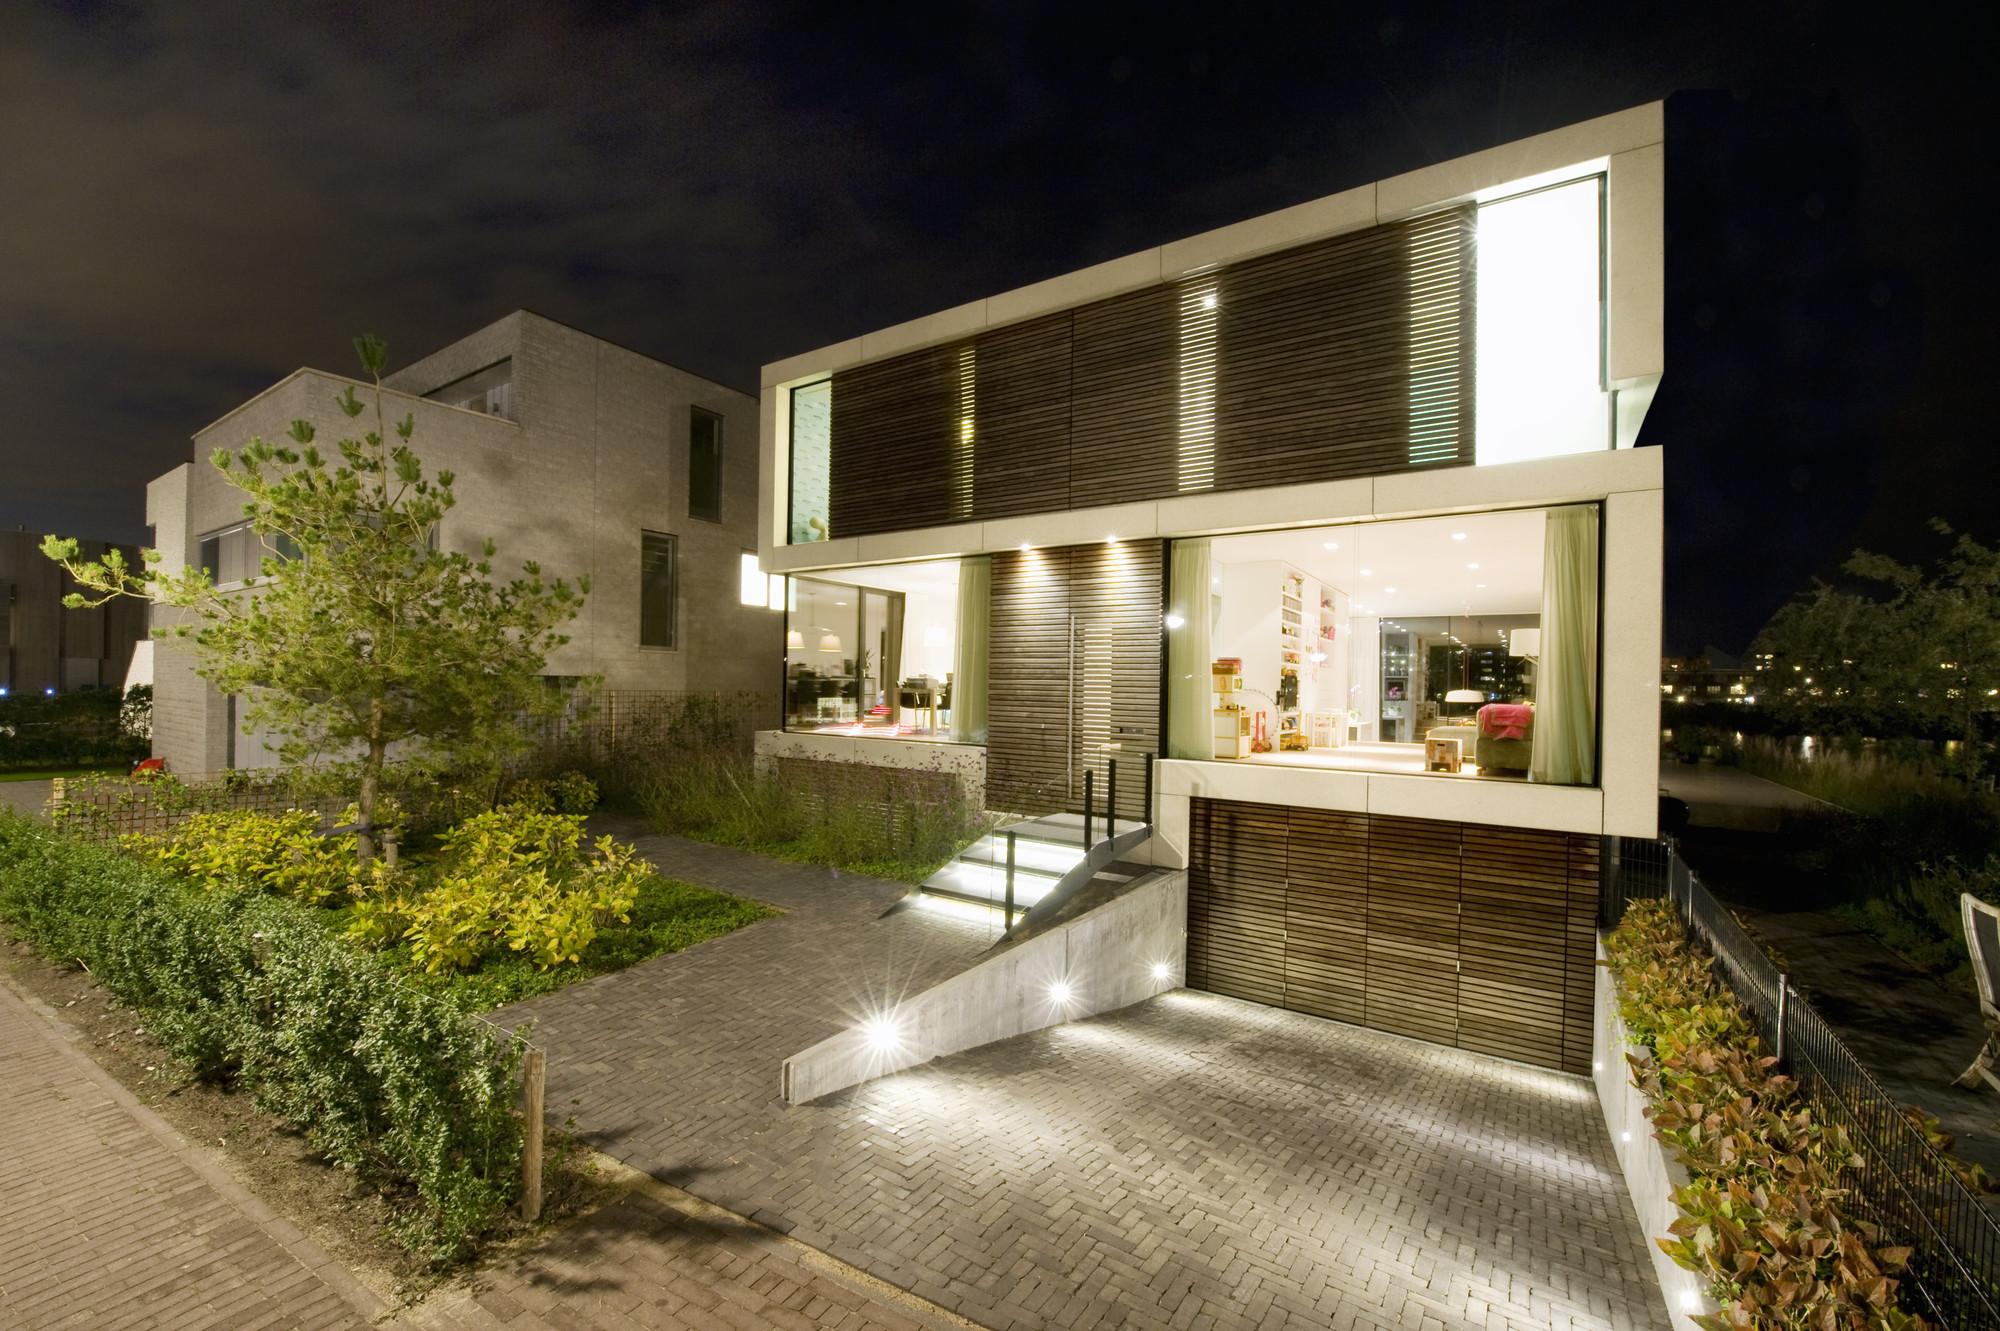 Villa S2 / MARC architects